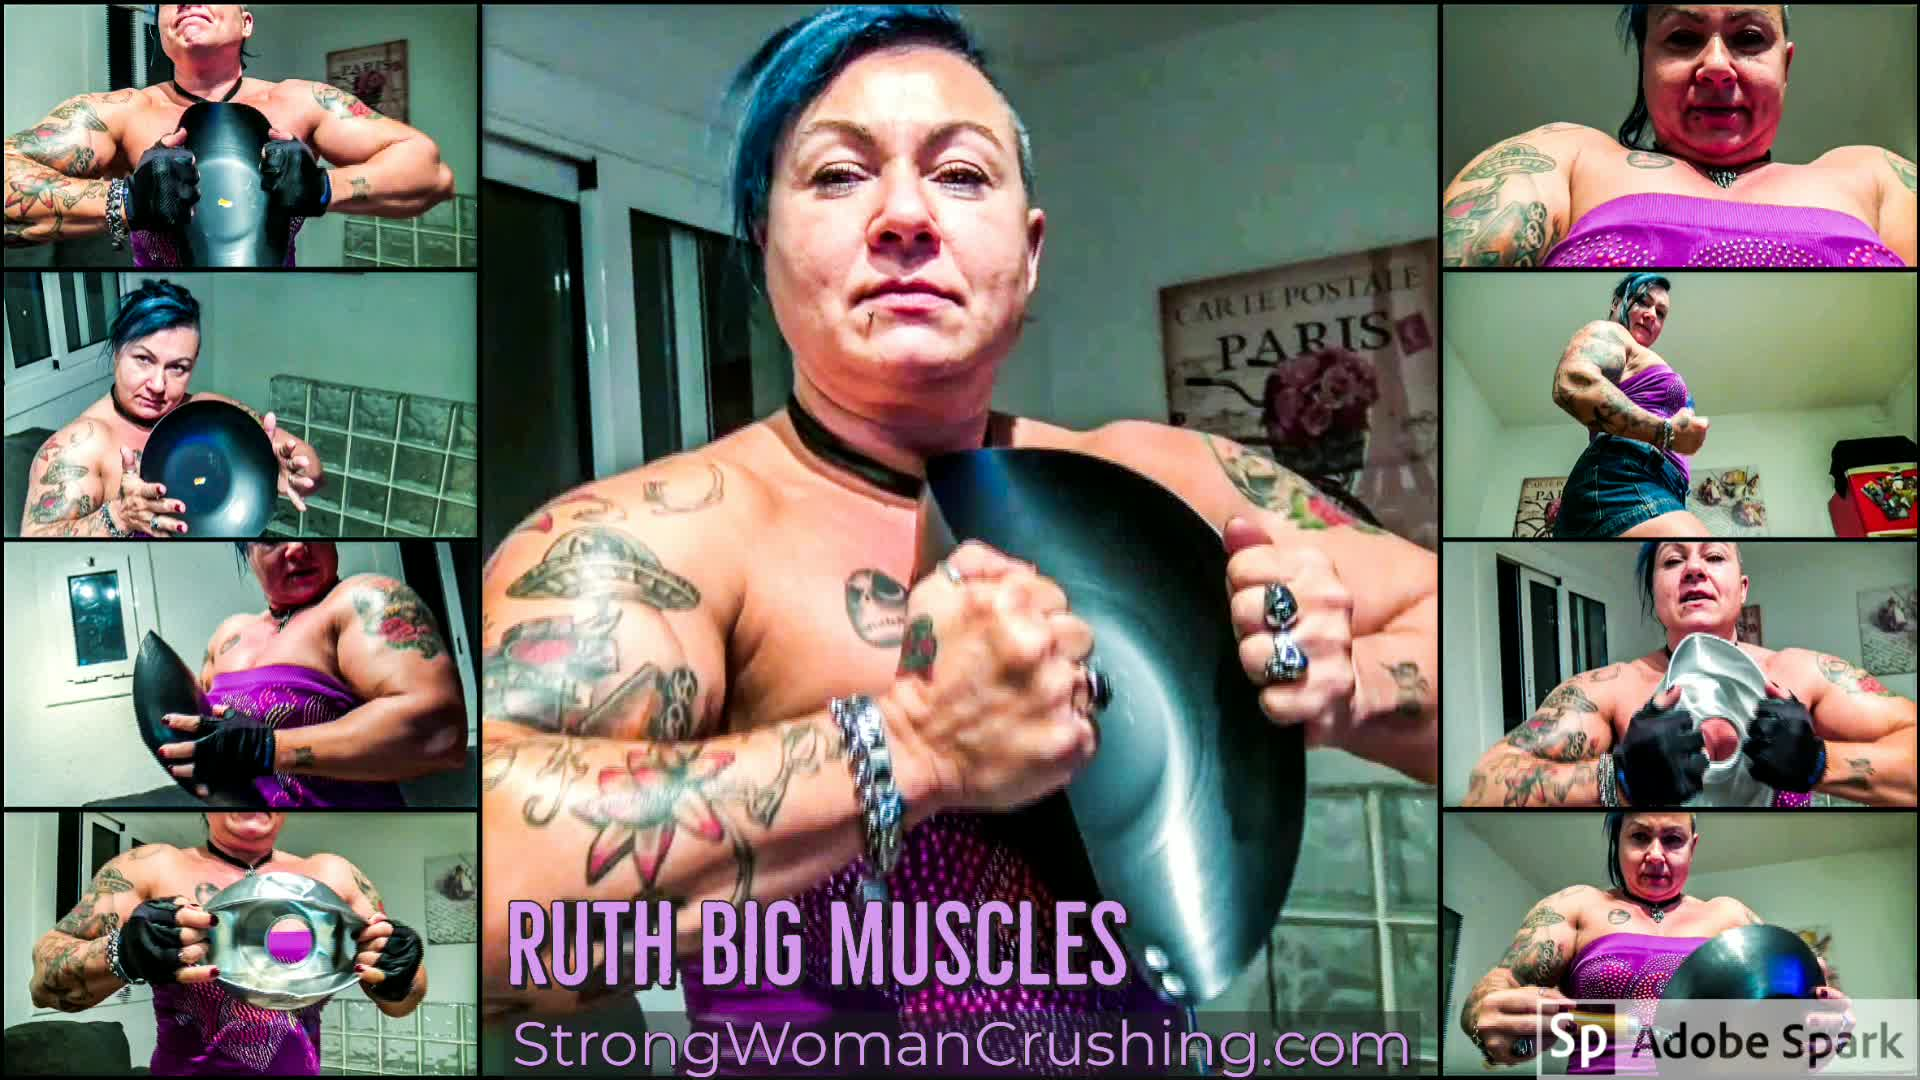 Ruth destroys pans